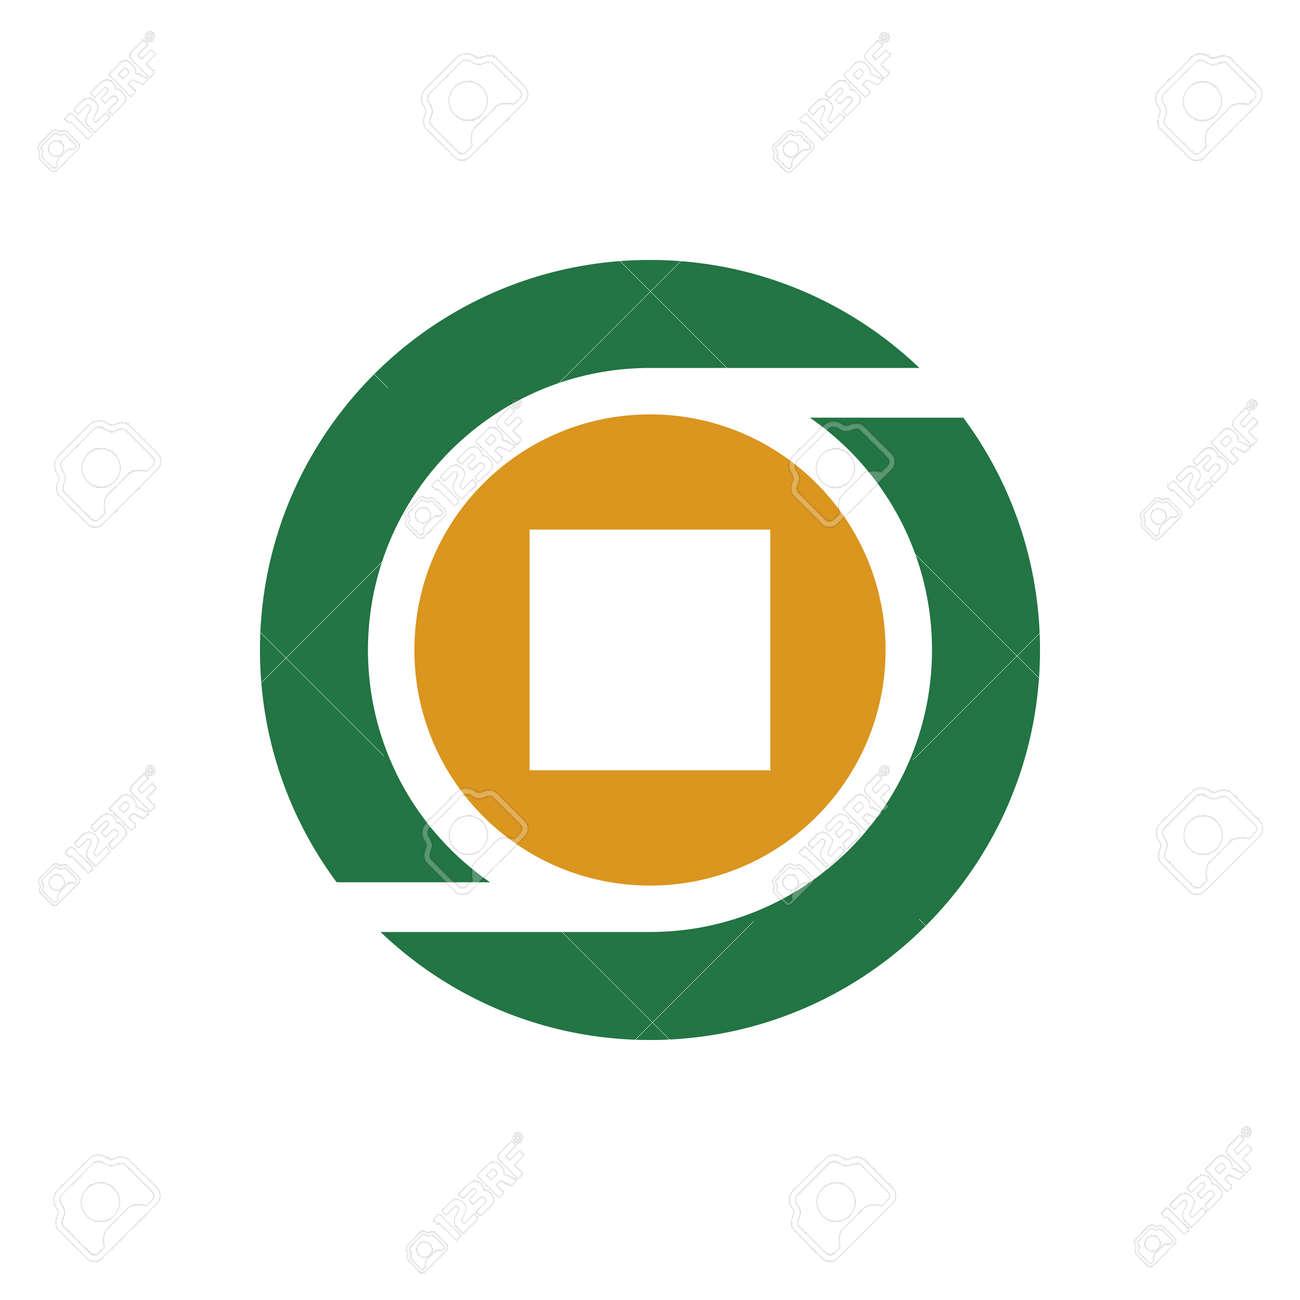 Letter O money coin logo icon design template, square shape inside a circle - Vector - 167527798